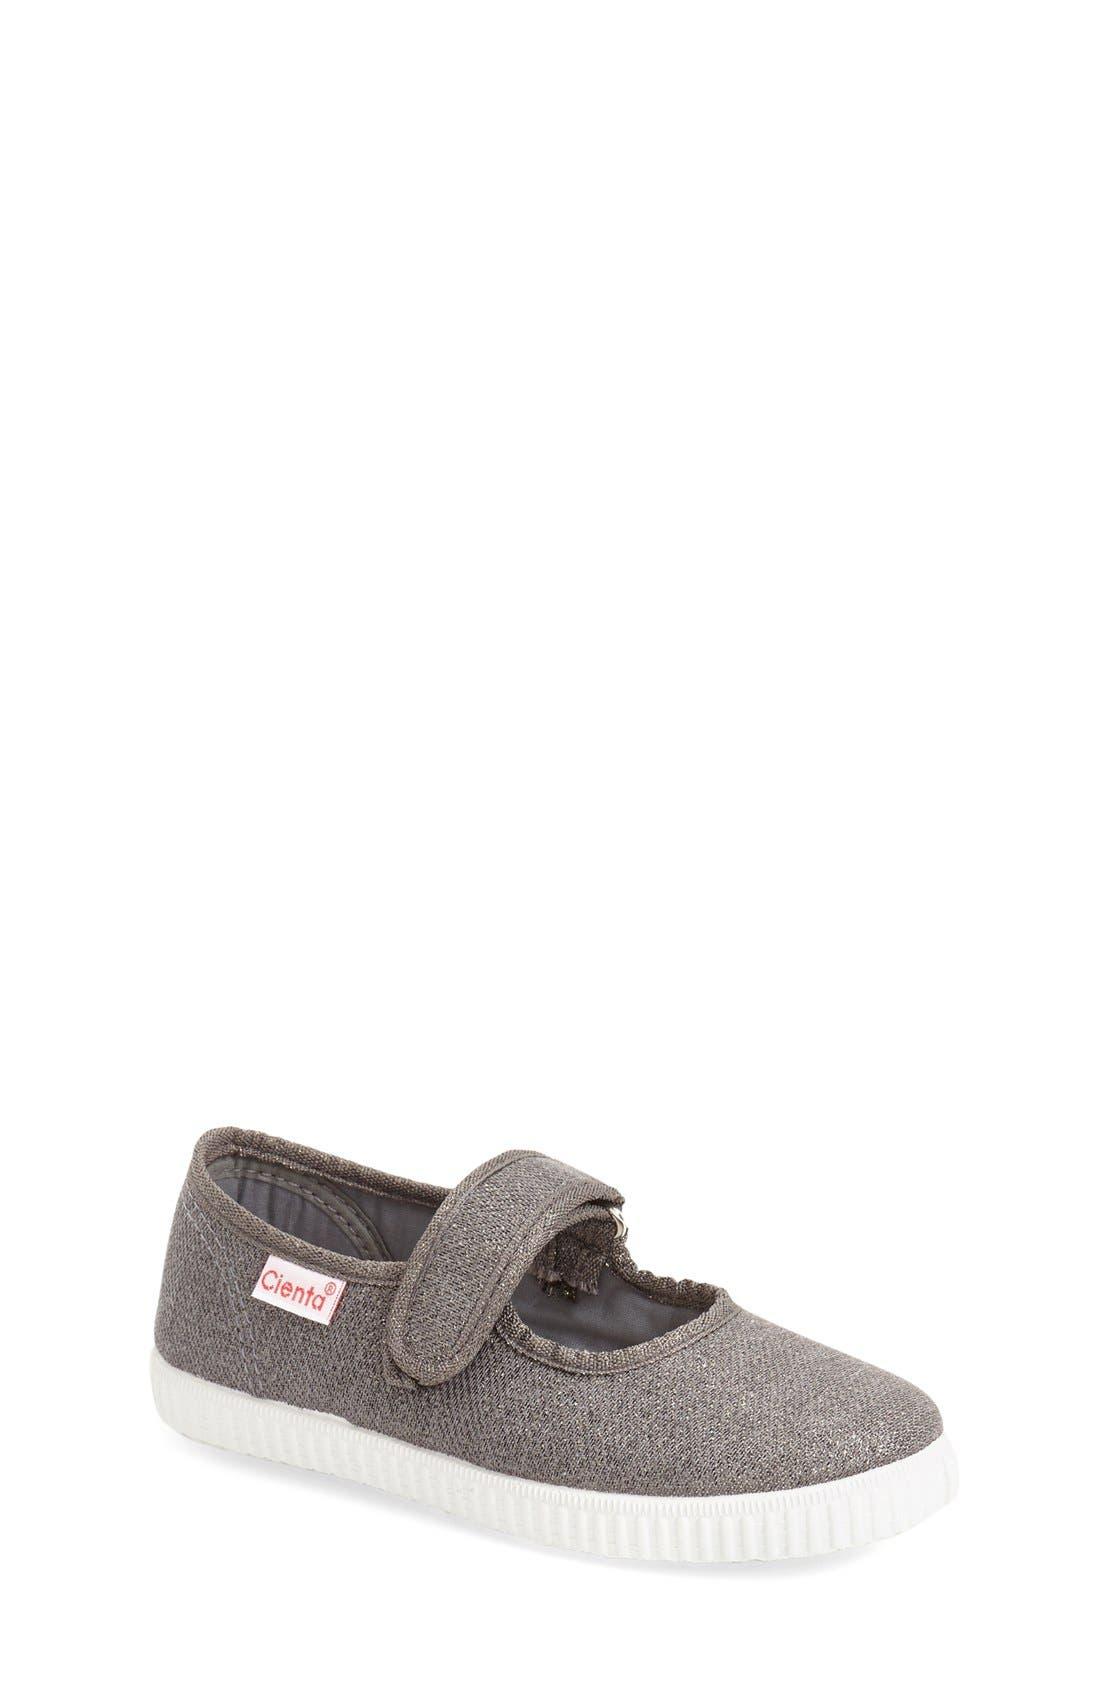 CIENTA Mary Jane Sneaker